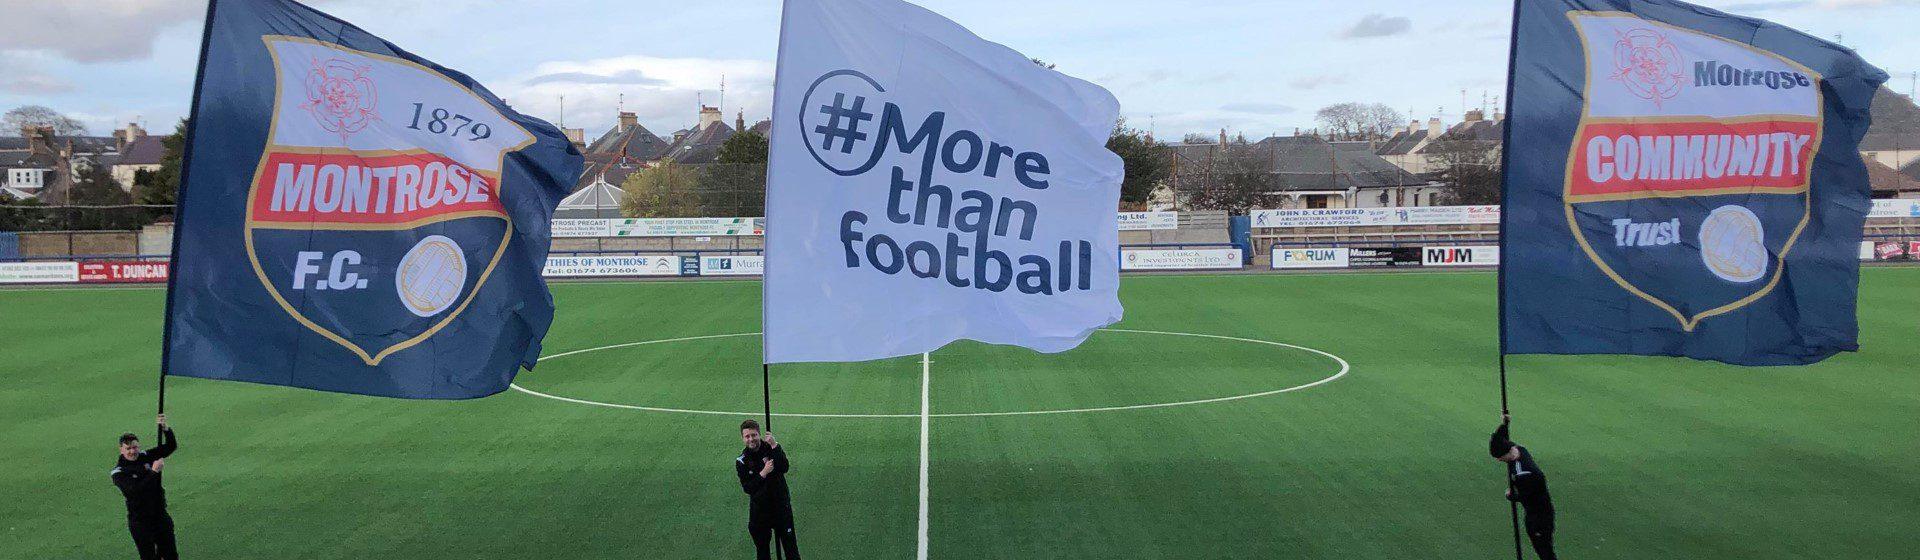 Montrose Community Trust header